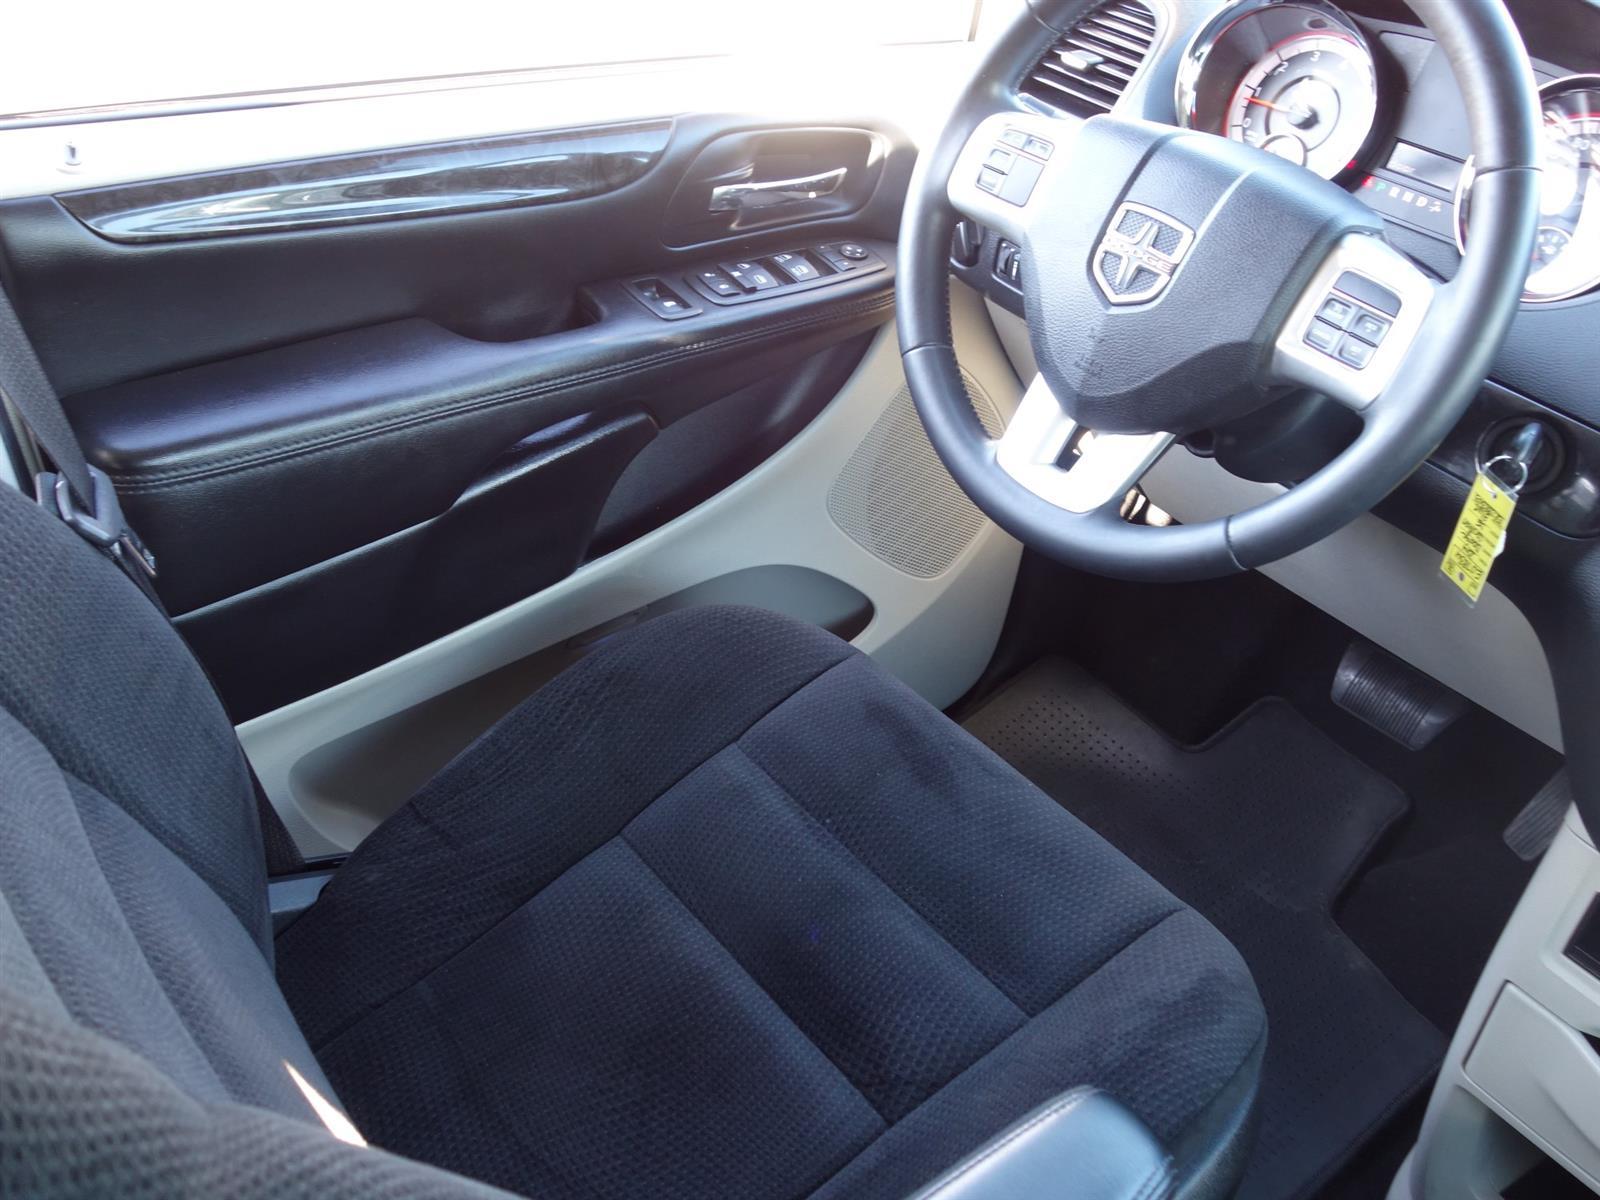 2014 Dodge CARAVAN GRAND CARAVAN SE